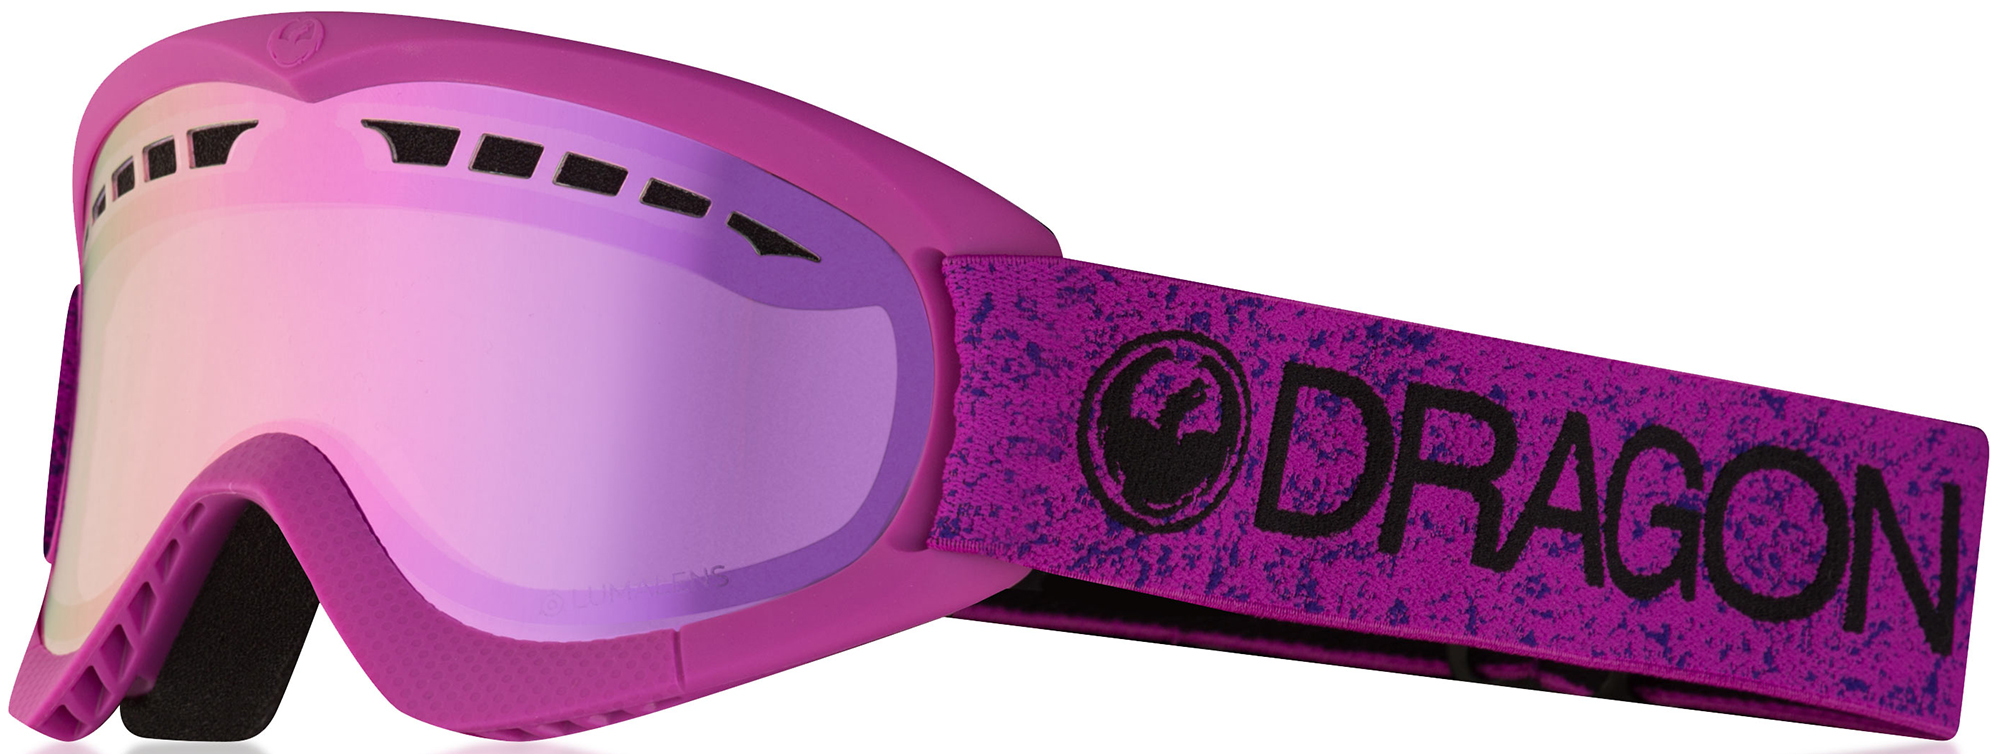 Dragon Маска сноубордическая Dragon DXS маска для сноуборда dragon nfxs plot pink ion yellow